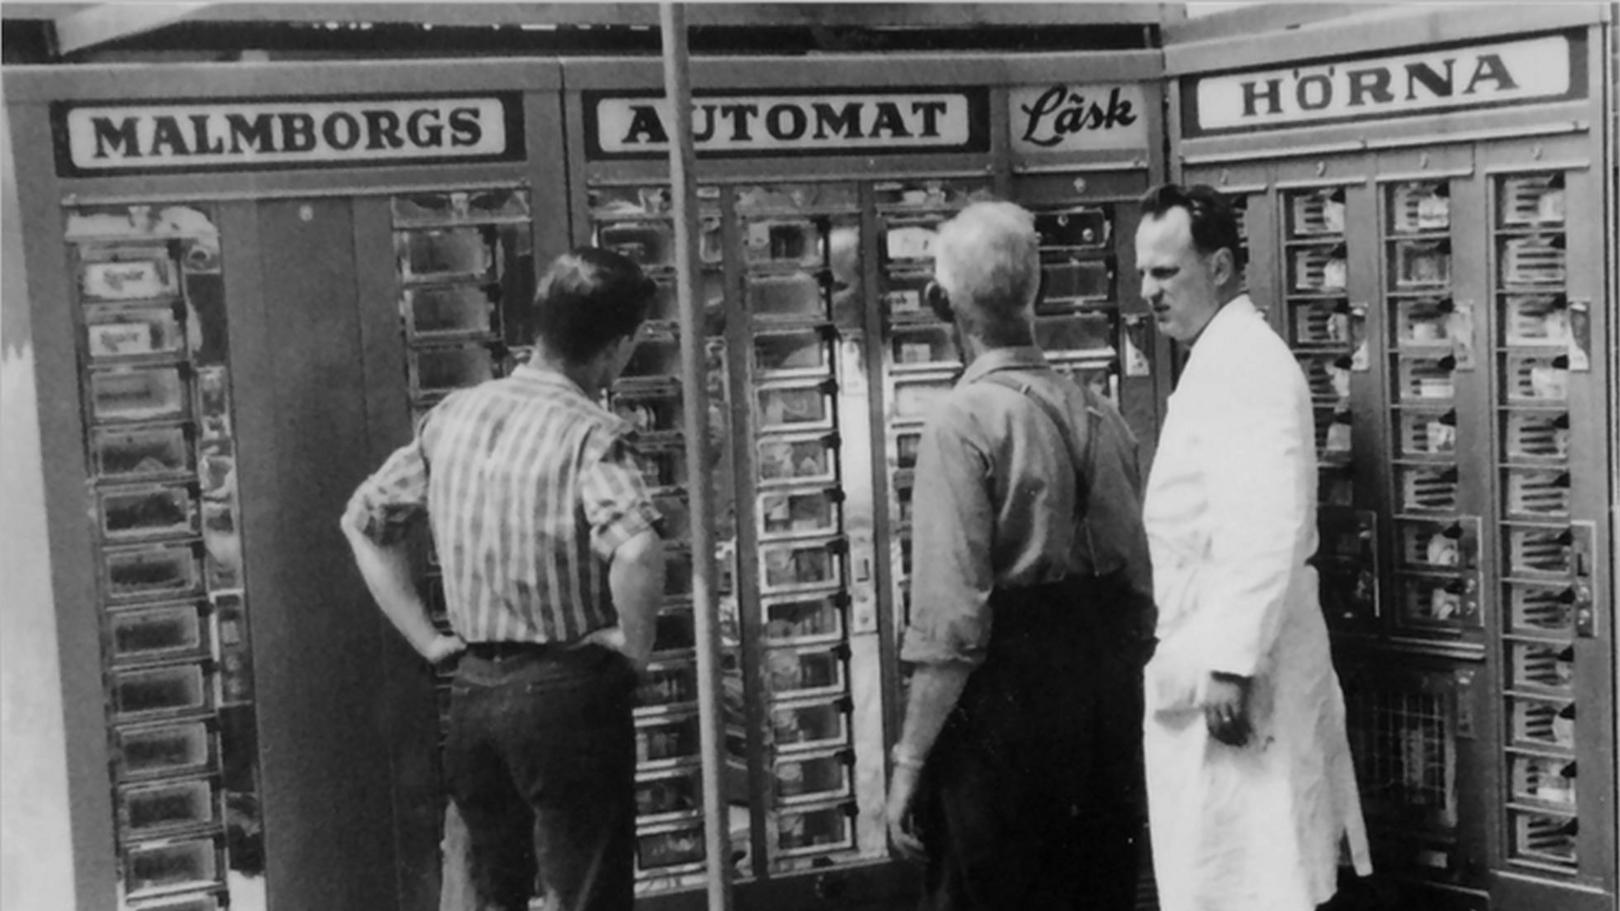 Malmborgs mjölkbutik 1954